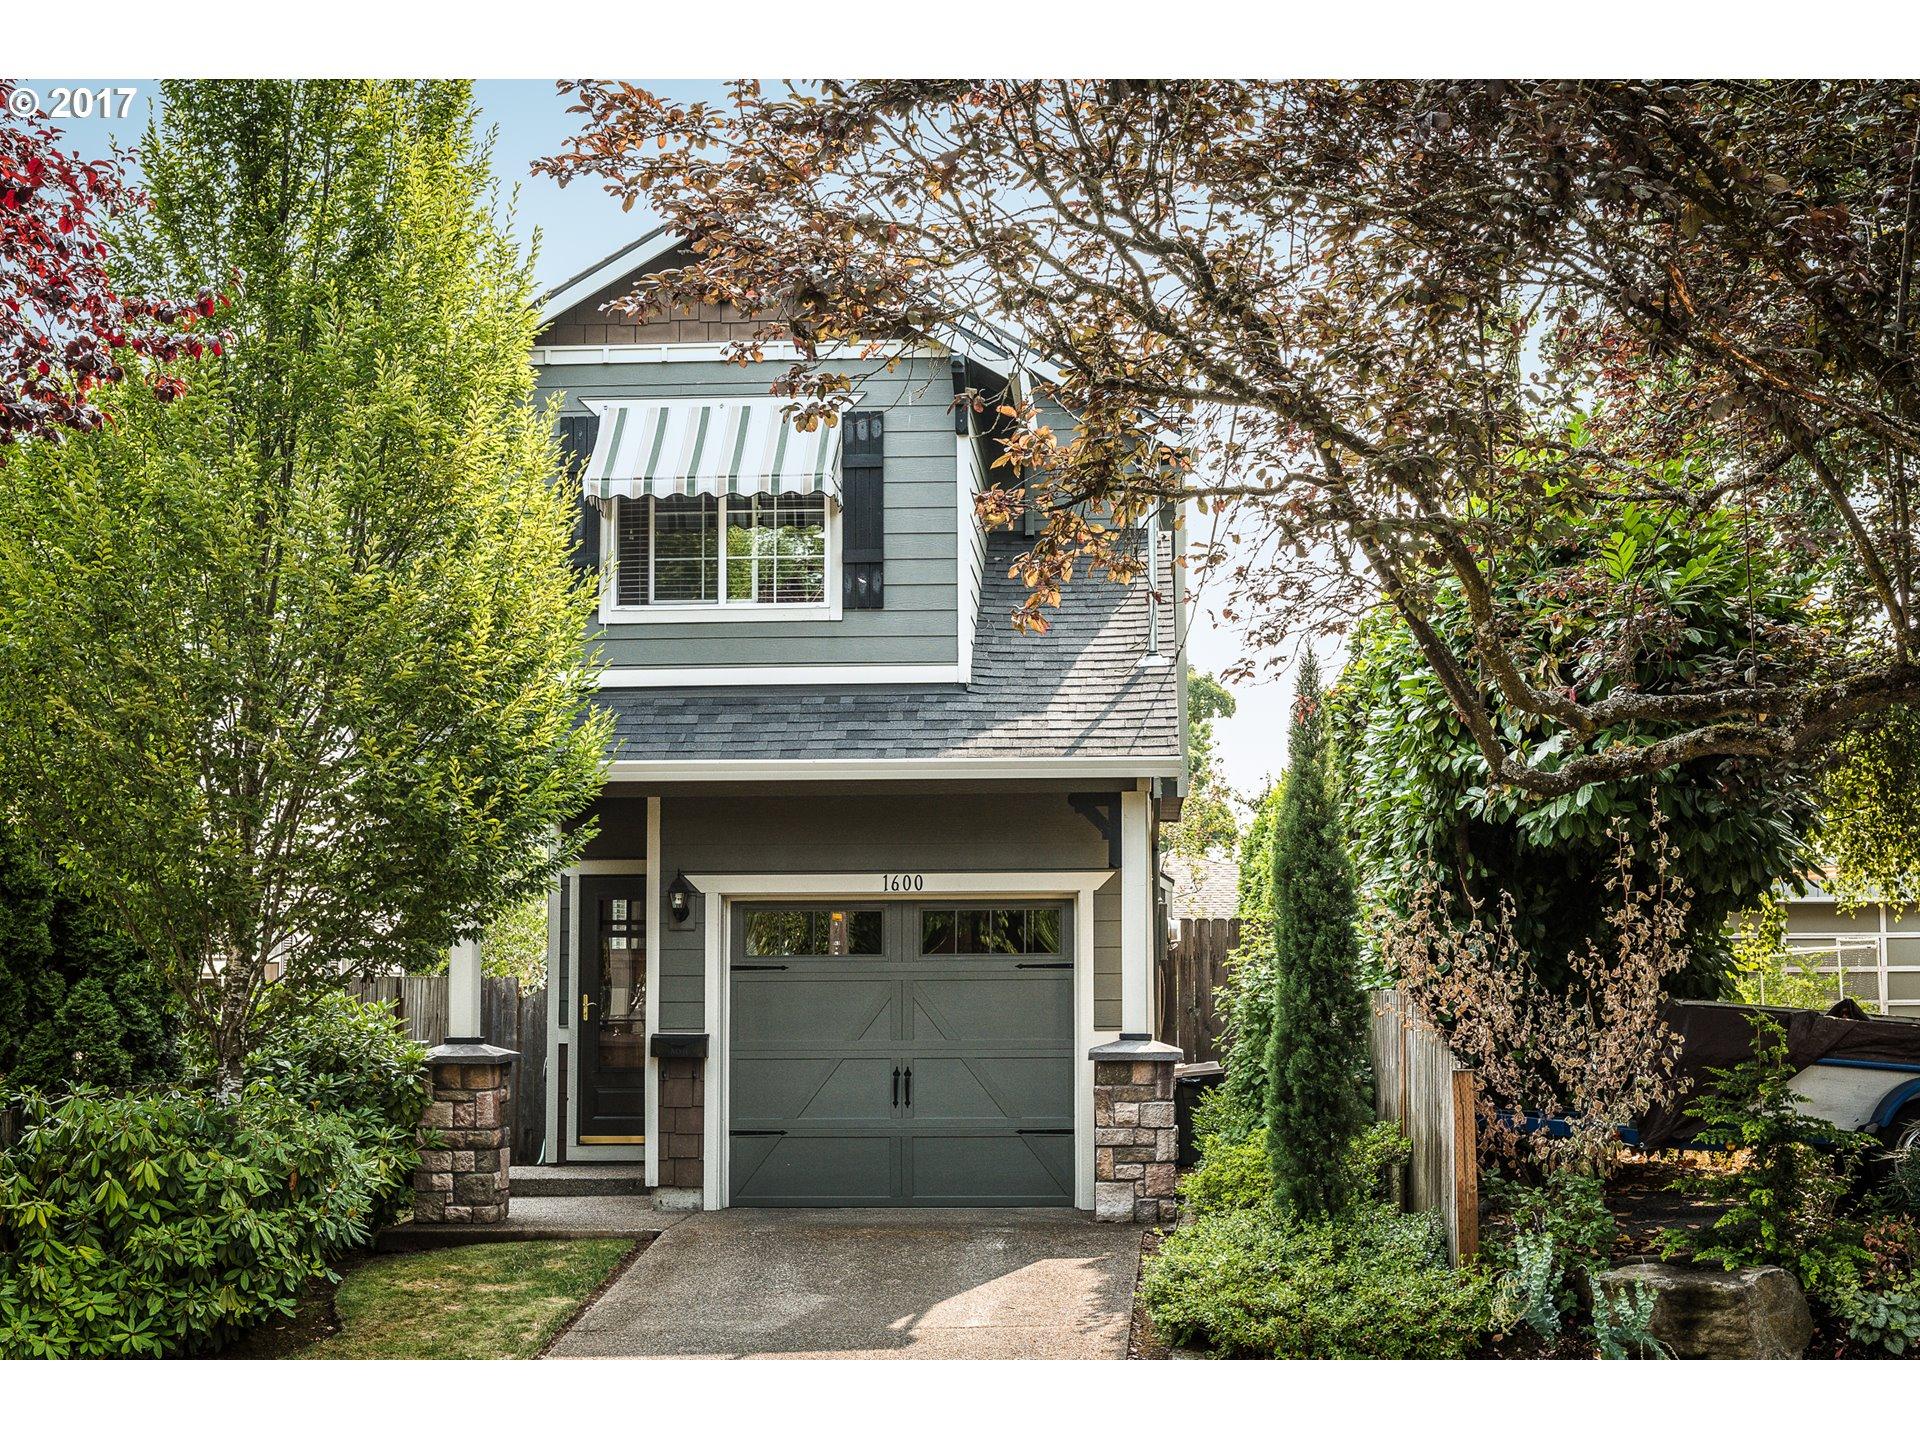 1600 NE 76TH AVE, Portland, OR 97213